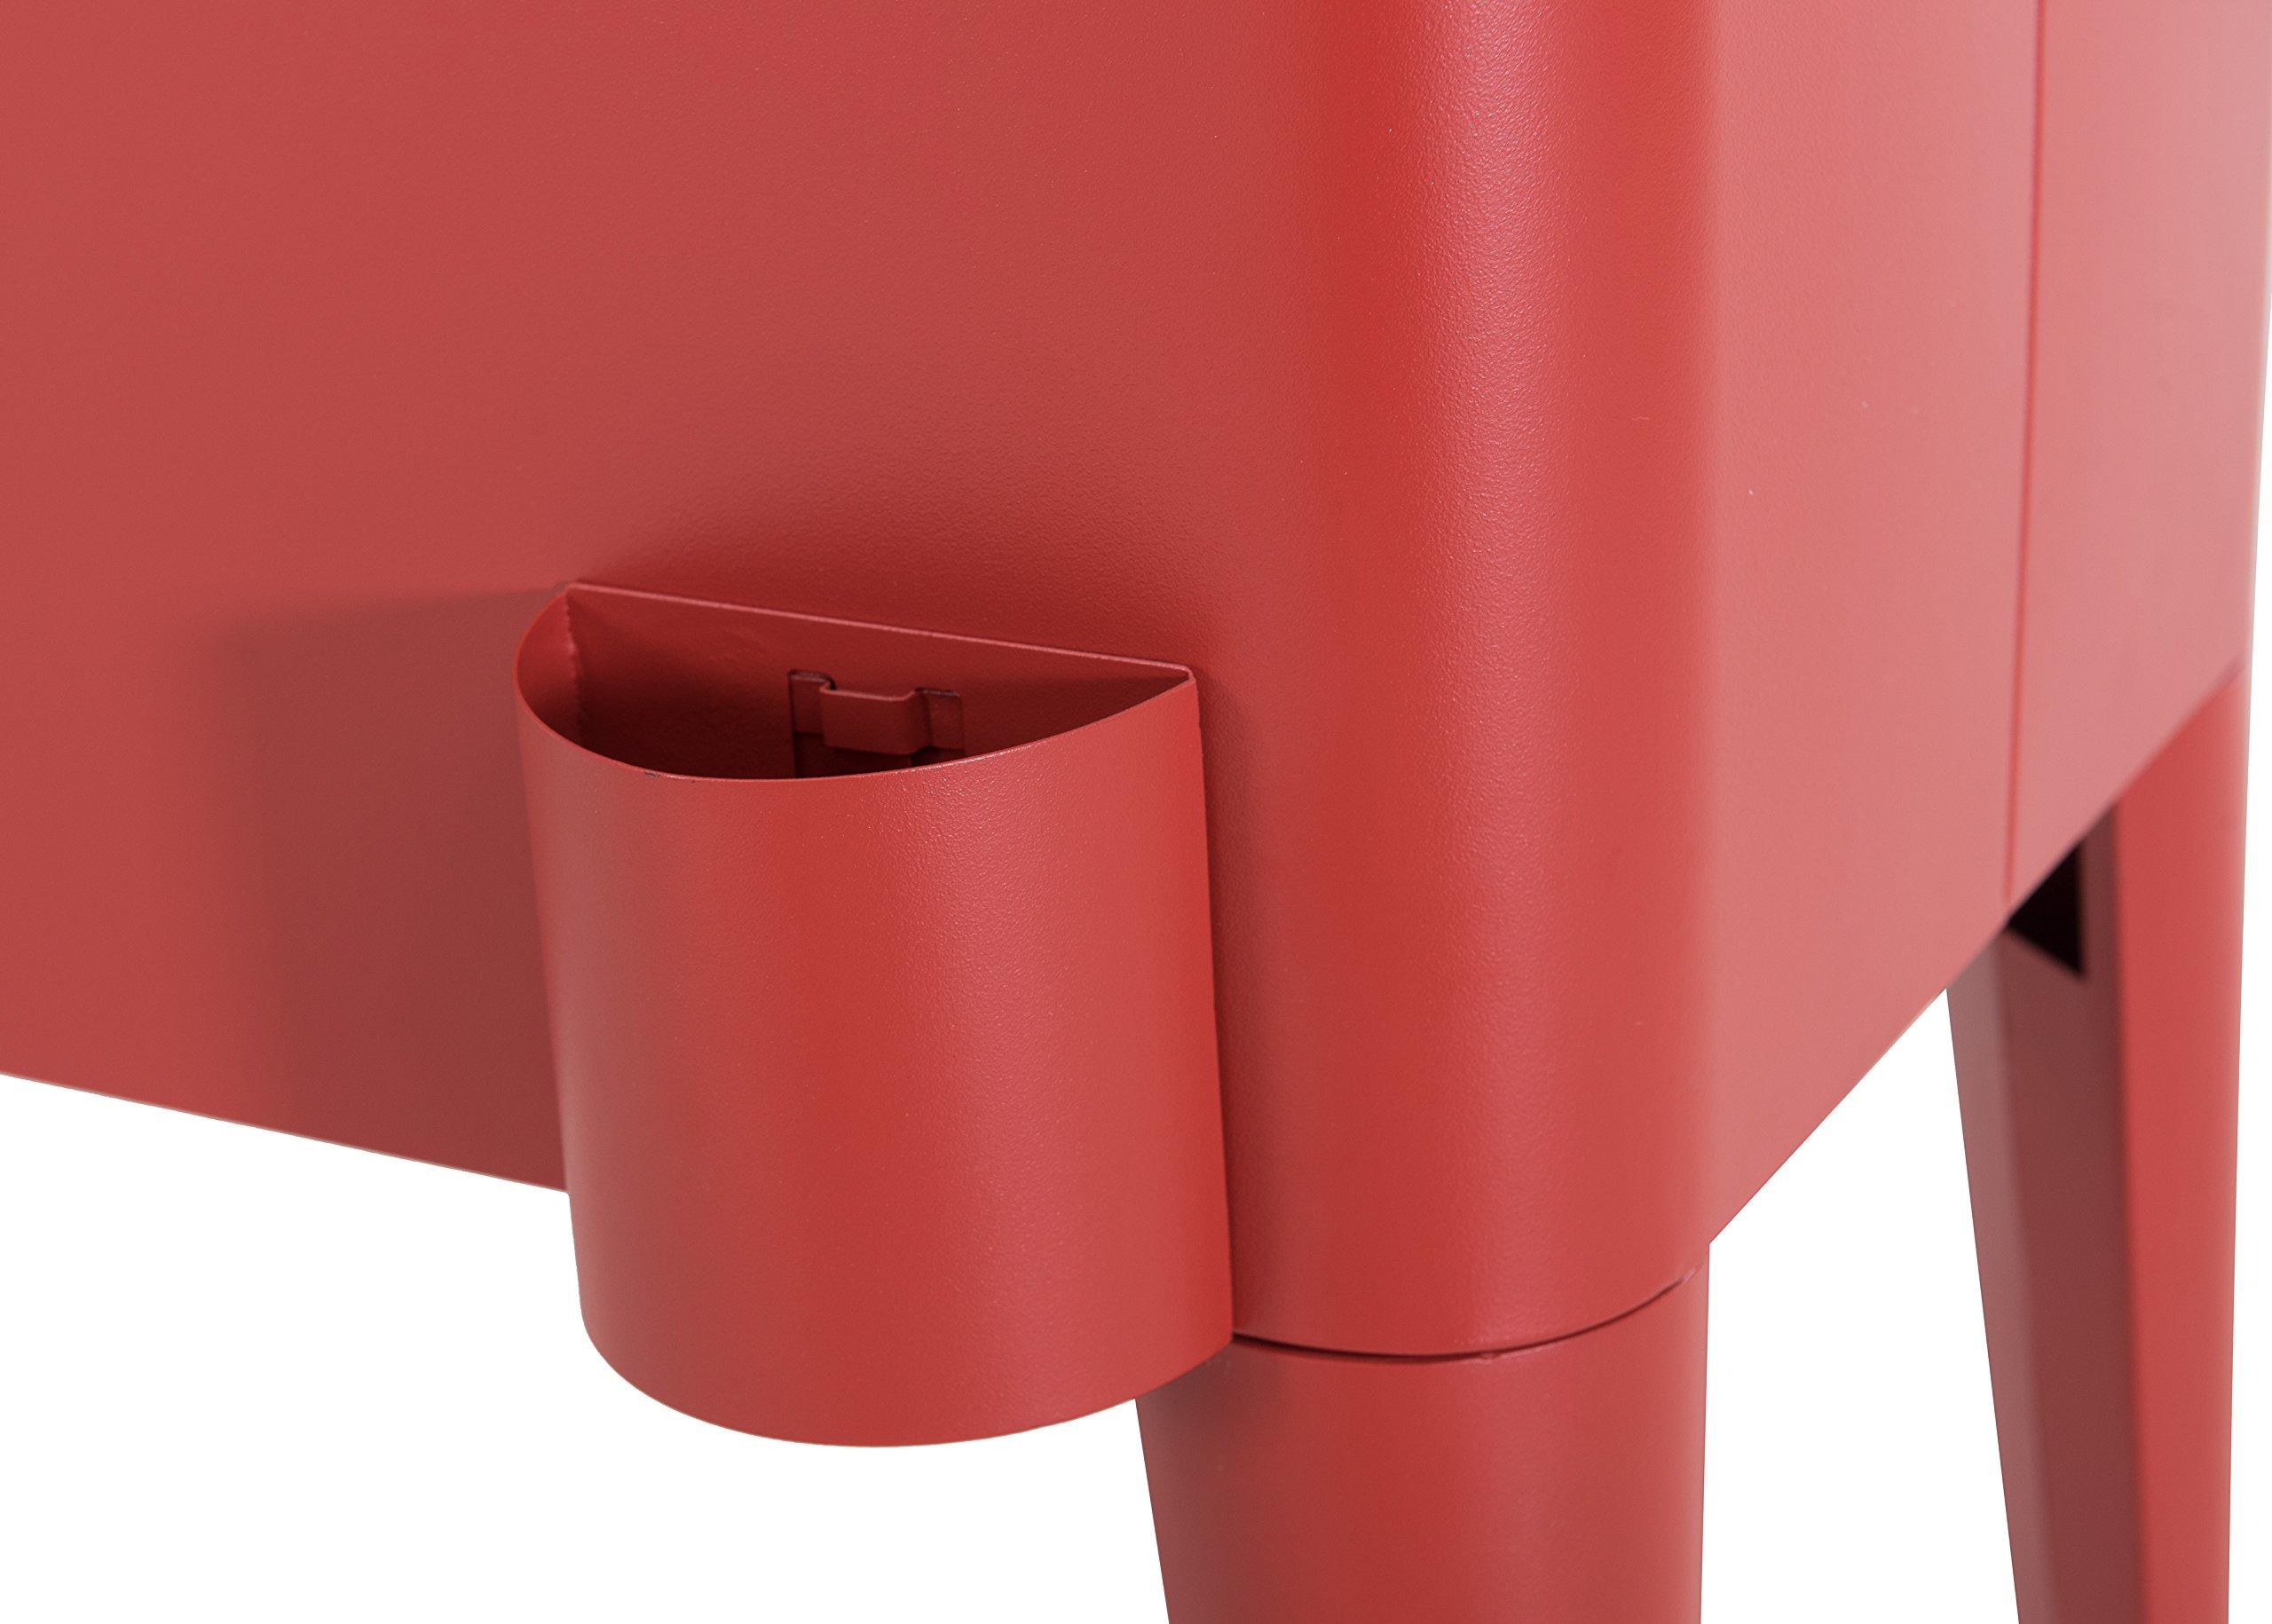 Sunjoy L-BC153PST 60 quart Wheeled Beverage Cooler in Red by sunjoy (Image #10)